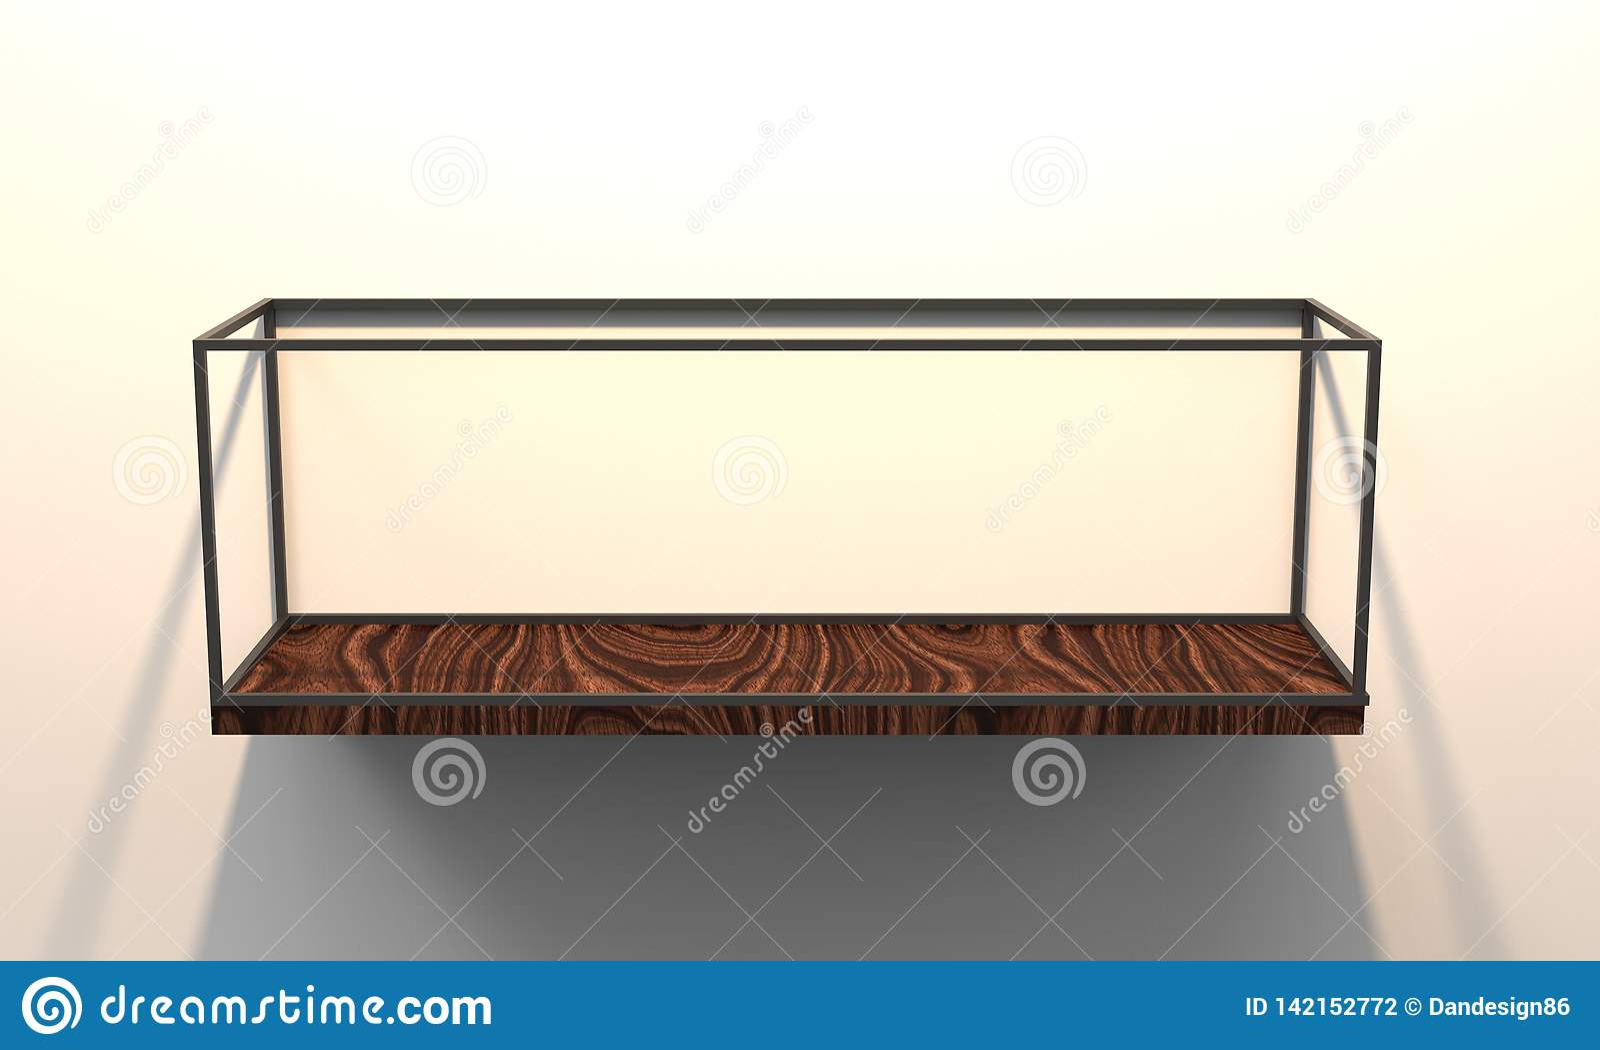 3d Illustration Of A Modern Floating Shelf Stock